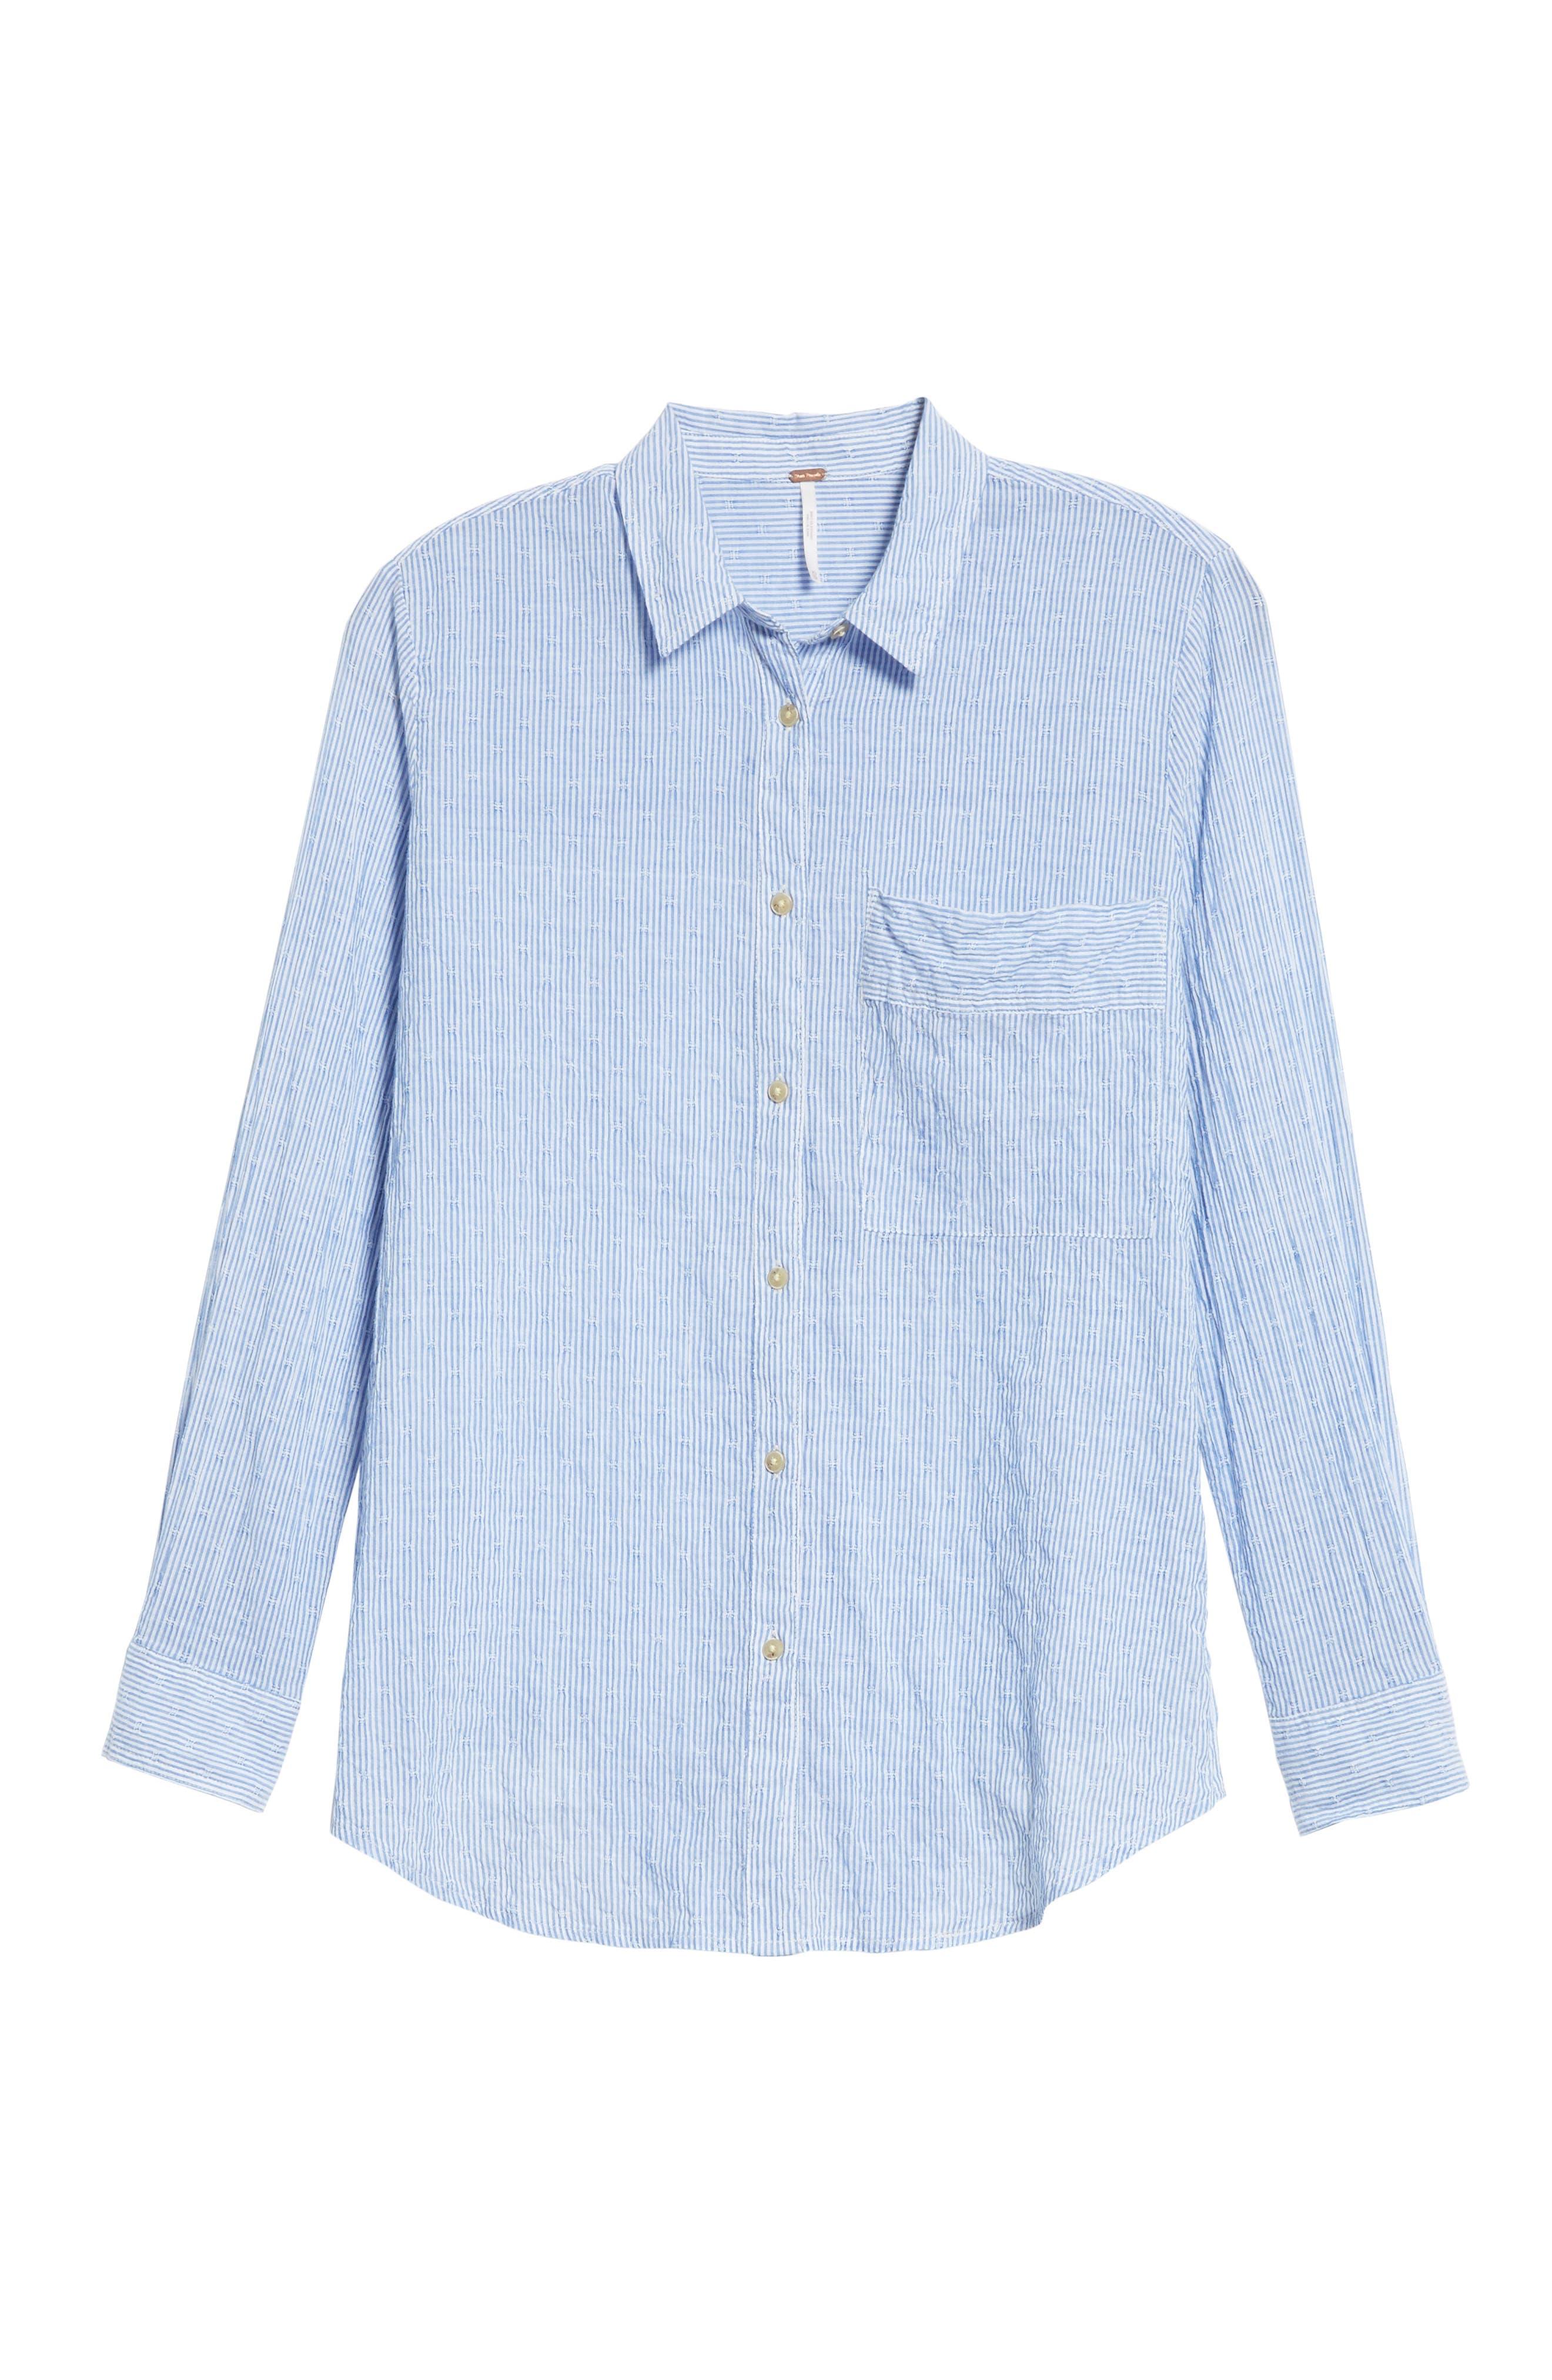 No Limits Stripe Stretch Cotton Shirt,                             Alternate thumbnail 6, color,                             400